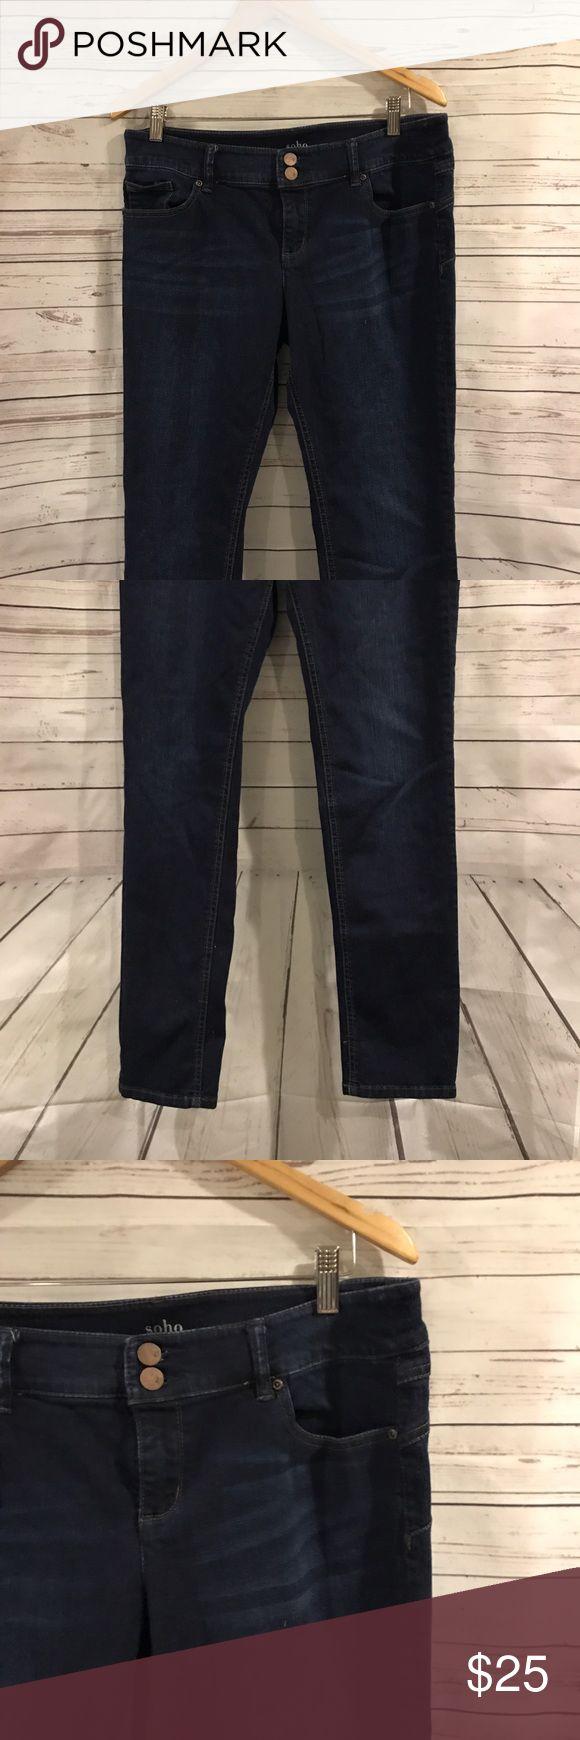 New York & Company skinny jeans Soho skinny jeans, size 12! Inseam 31. **E226 New York & Company Jeans Skinny